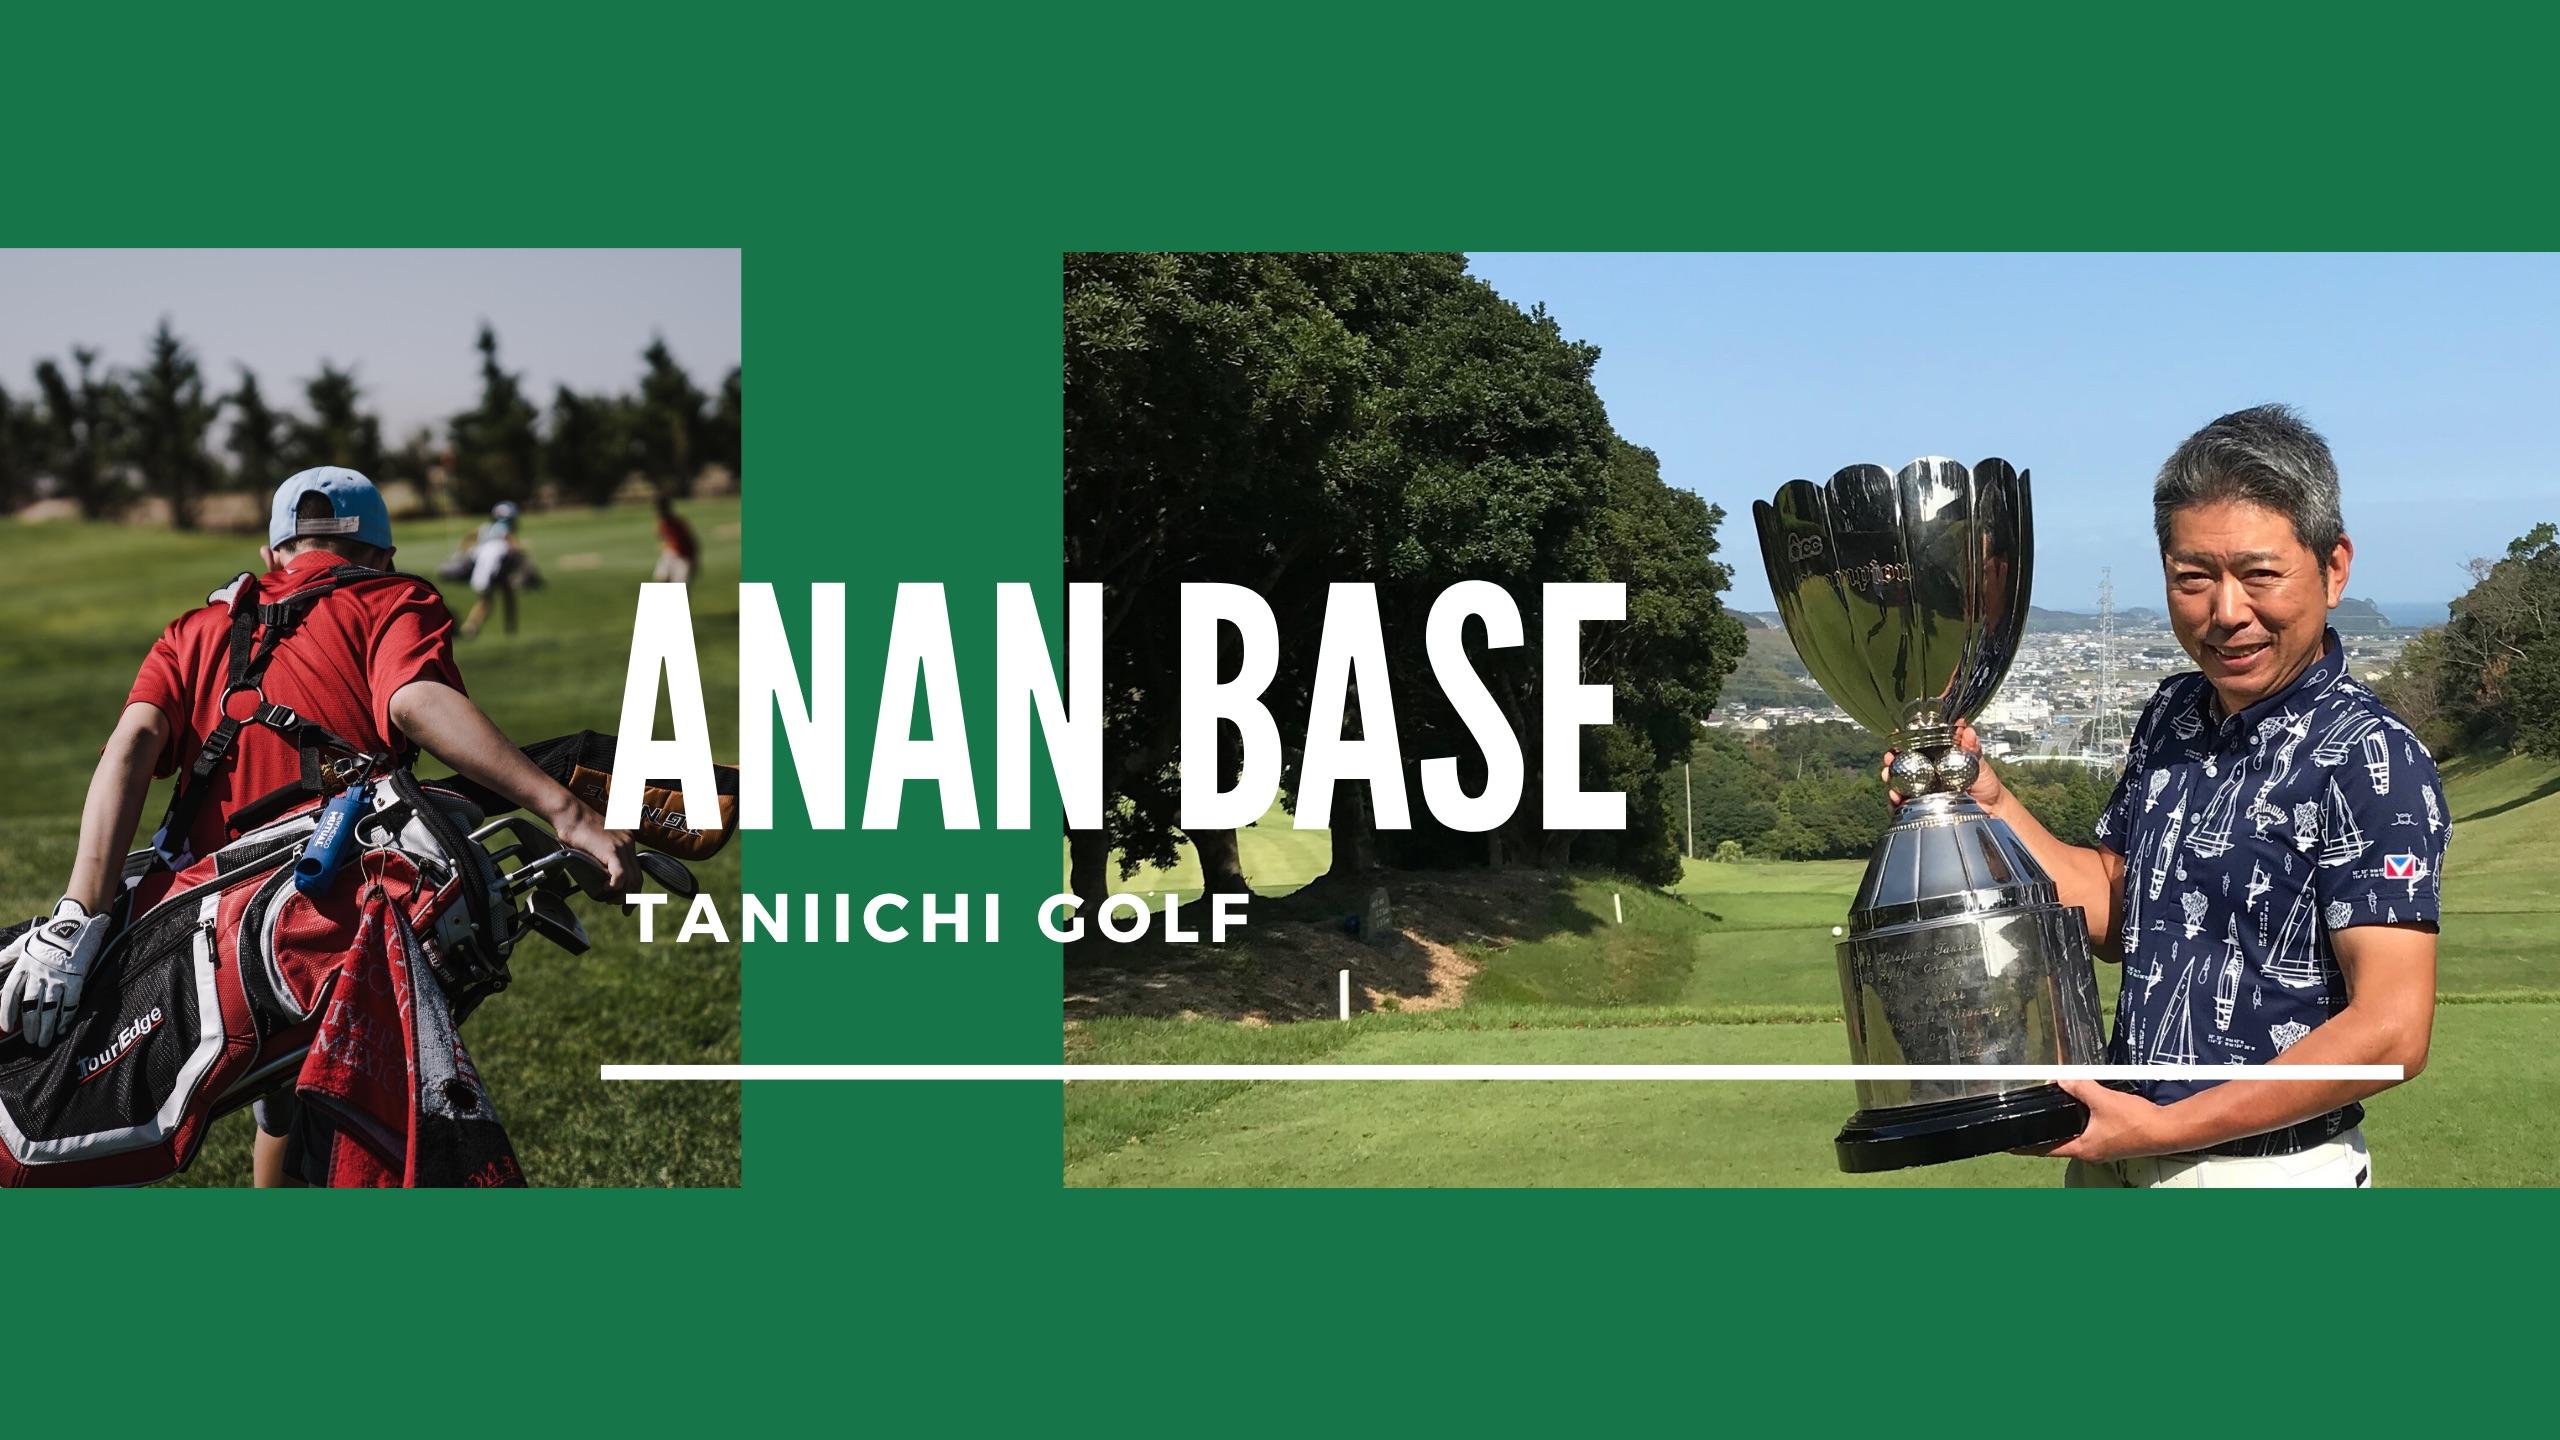 ANAN BASE(谷一ゴルフアカデミー) You Tube チャンネルはこちらから